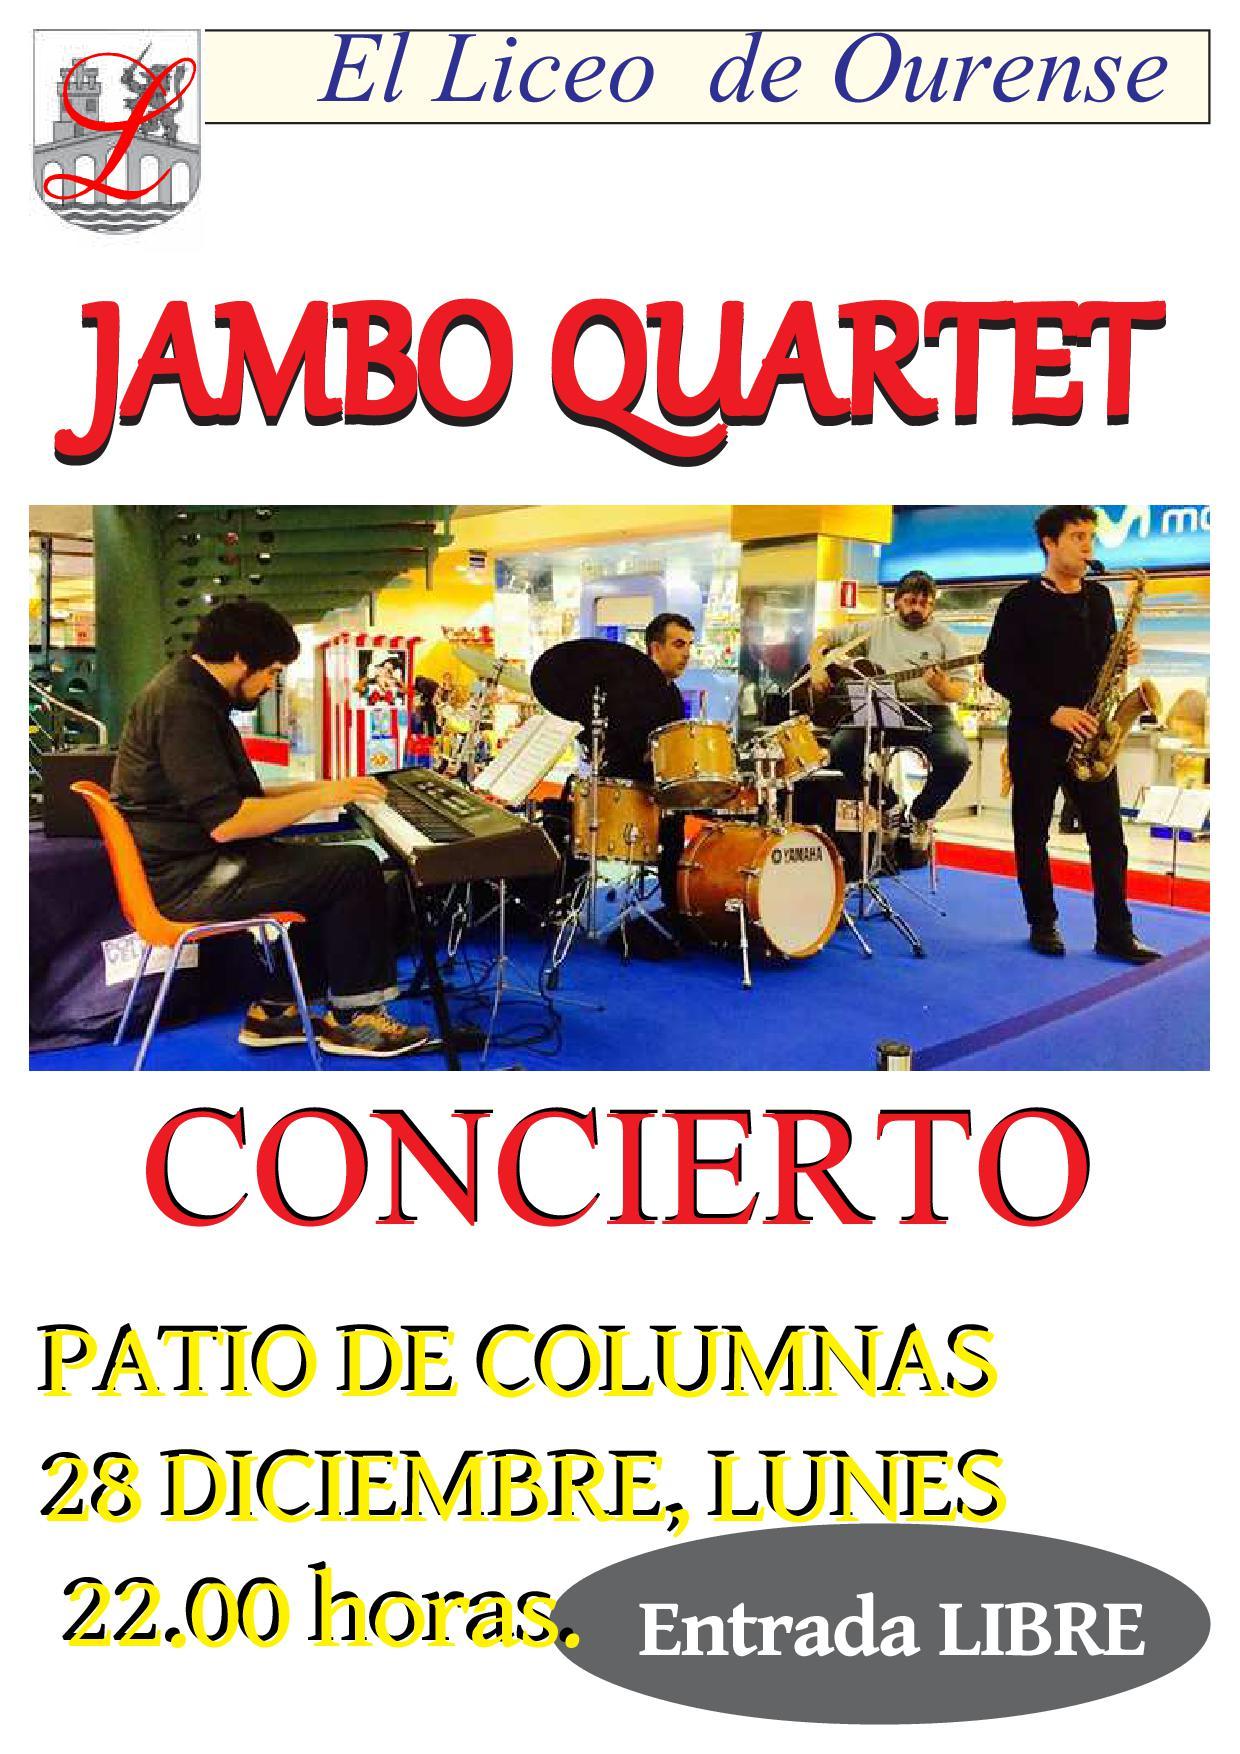 JAMBO CUARTET